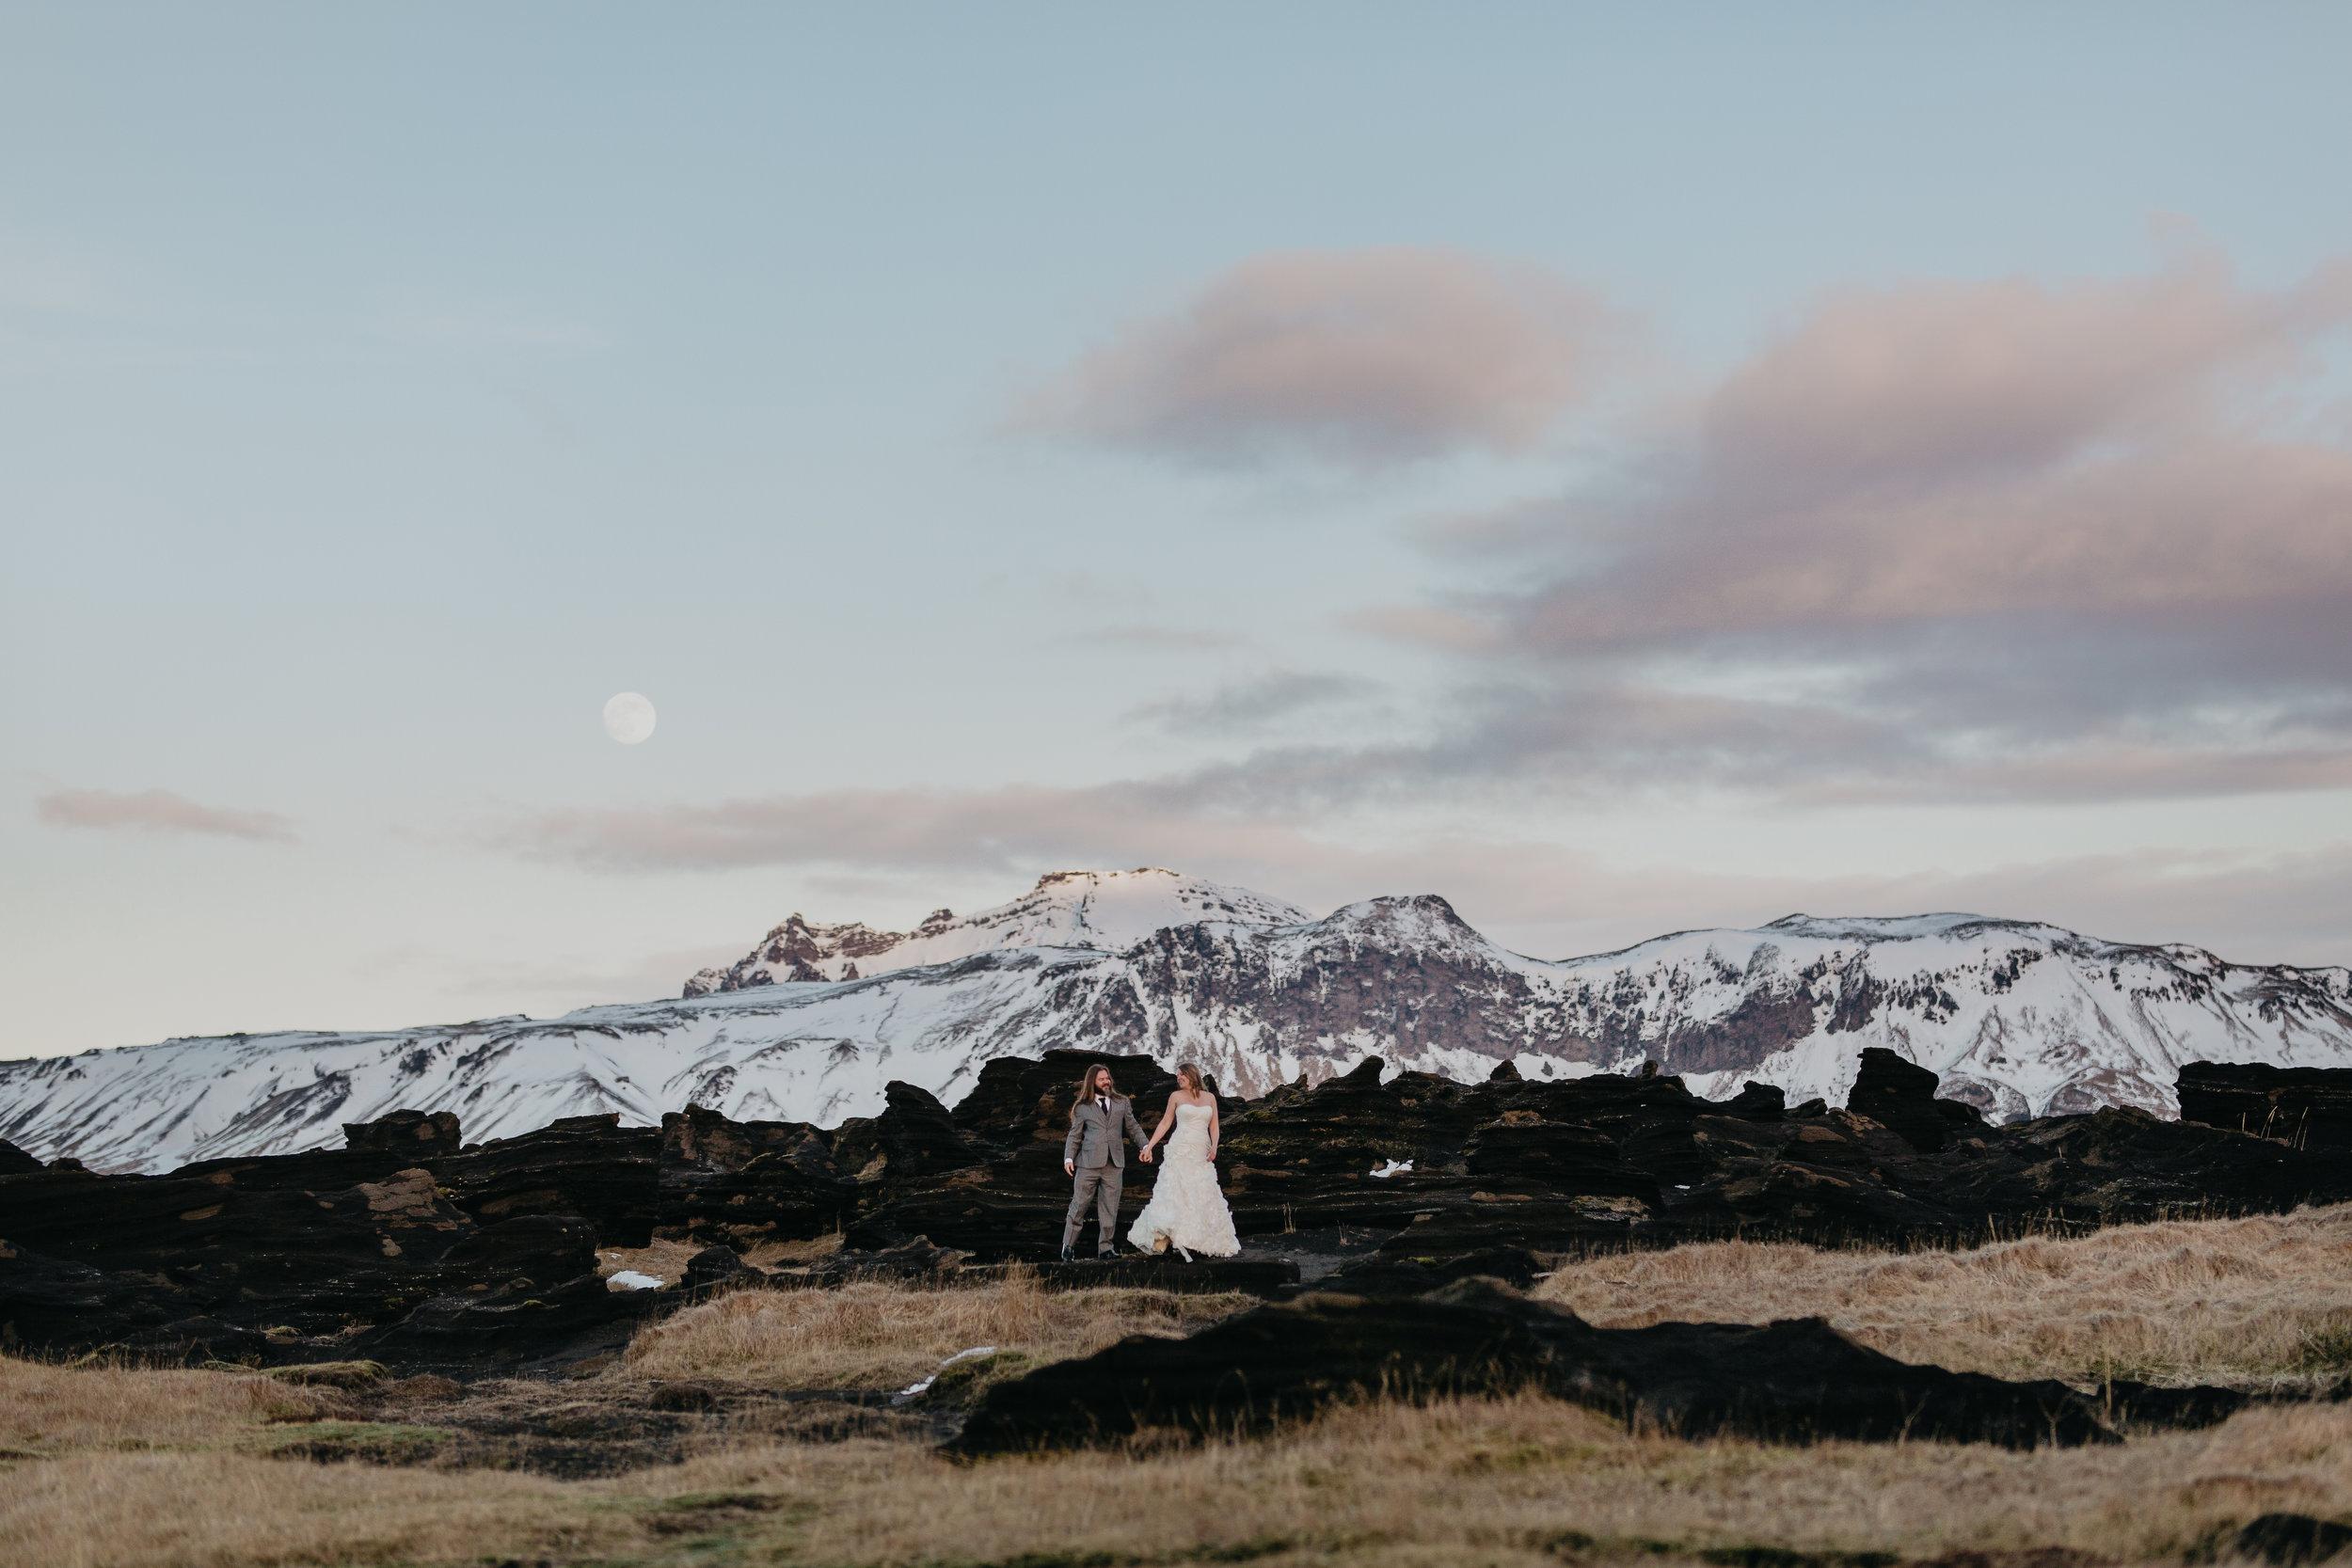 nicole-daacke-photography-iceland-winter-sunset-adventure-elopement-skogafoss-waterfall-black-sand-beach-dyrholaey-vik-iceland-intimate-wedding-black-church-elopement-photographer-26.jpg